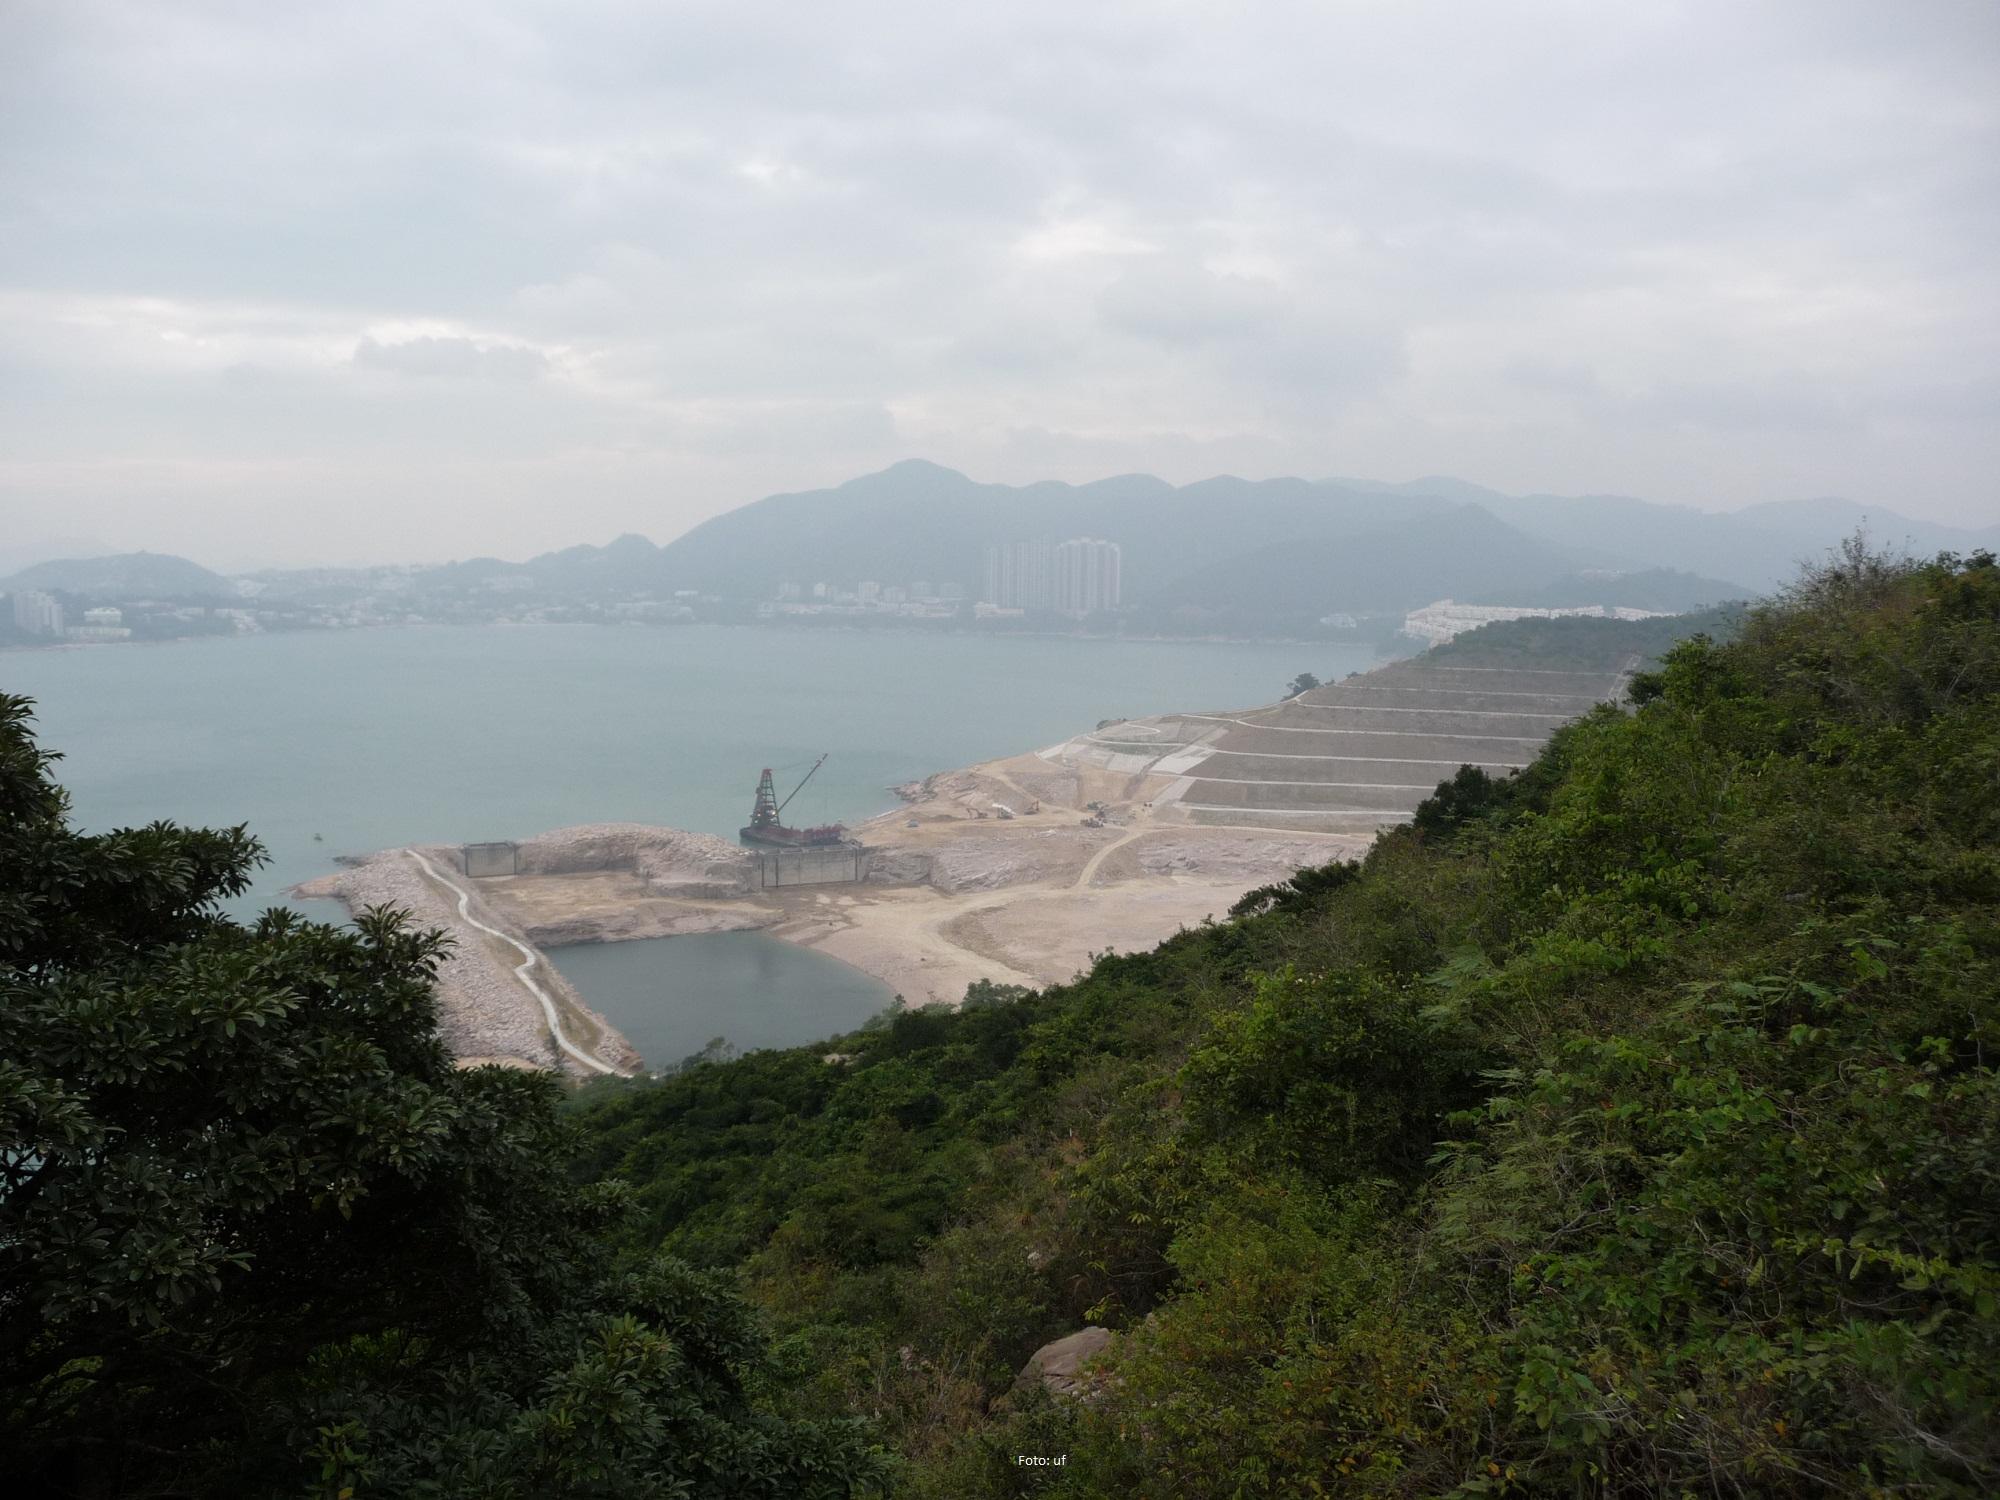 Landgewinnung - es geht immer weiter - Hongkong braucht Land